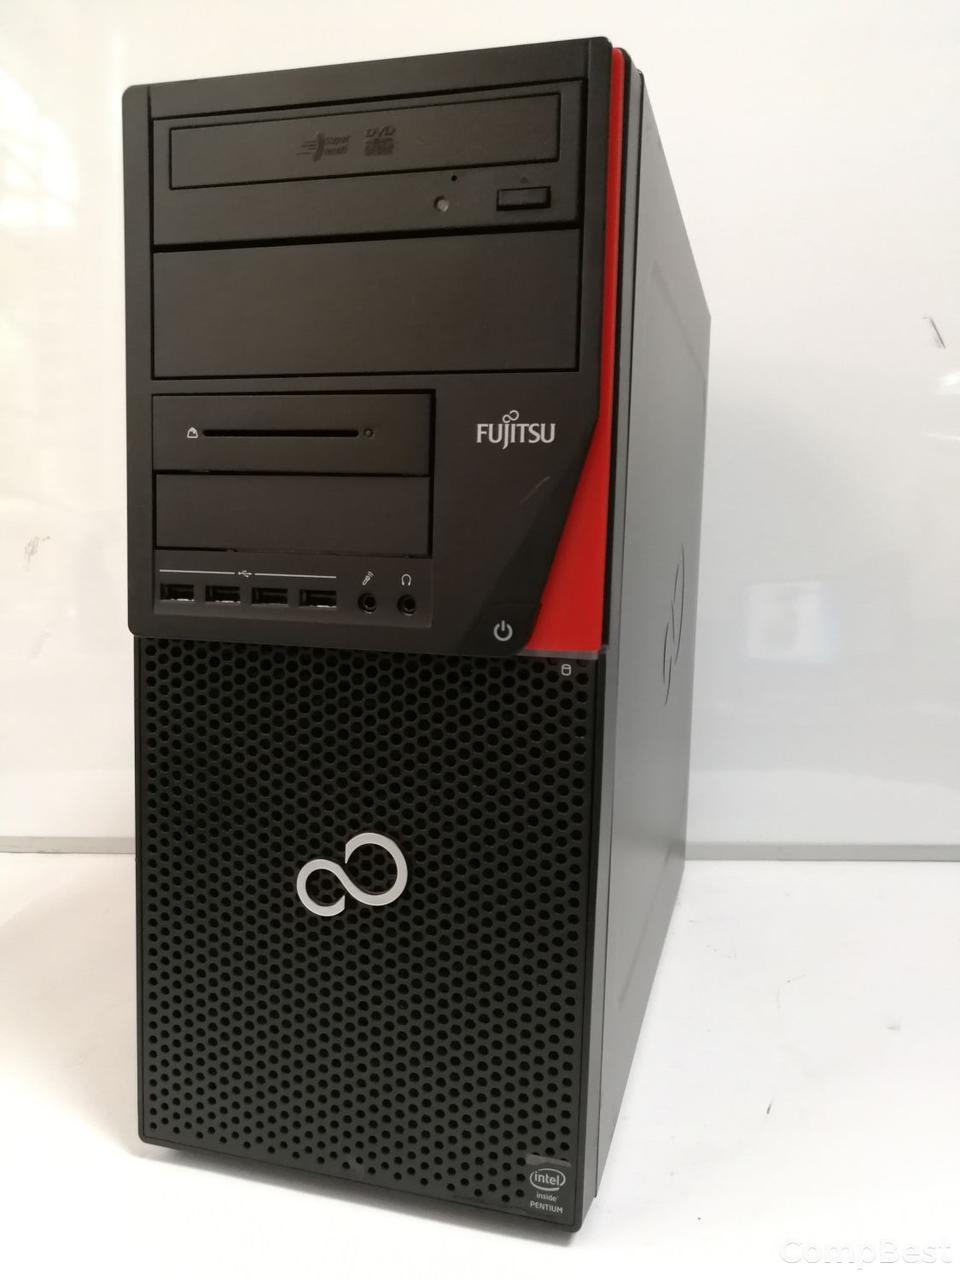 Fujitsu Esprimo P720 Tower / Intel® Pentium® G3220 (2 ядра по 3.0 GHz) / 4GB DDR3 / 120GB SSD НОВЫЙ / VGA, DVI, DP, USB 3.0